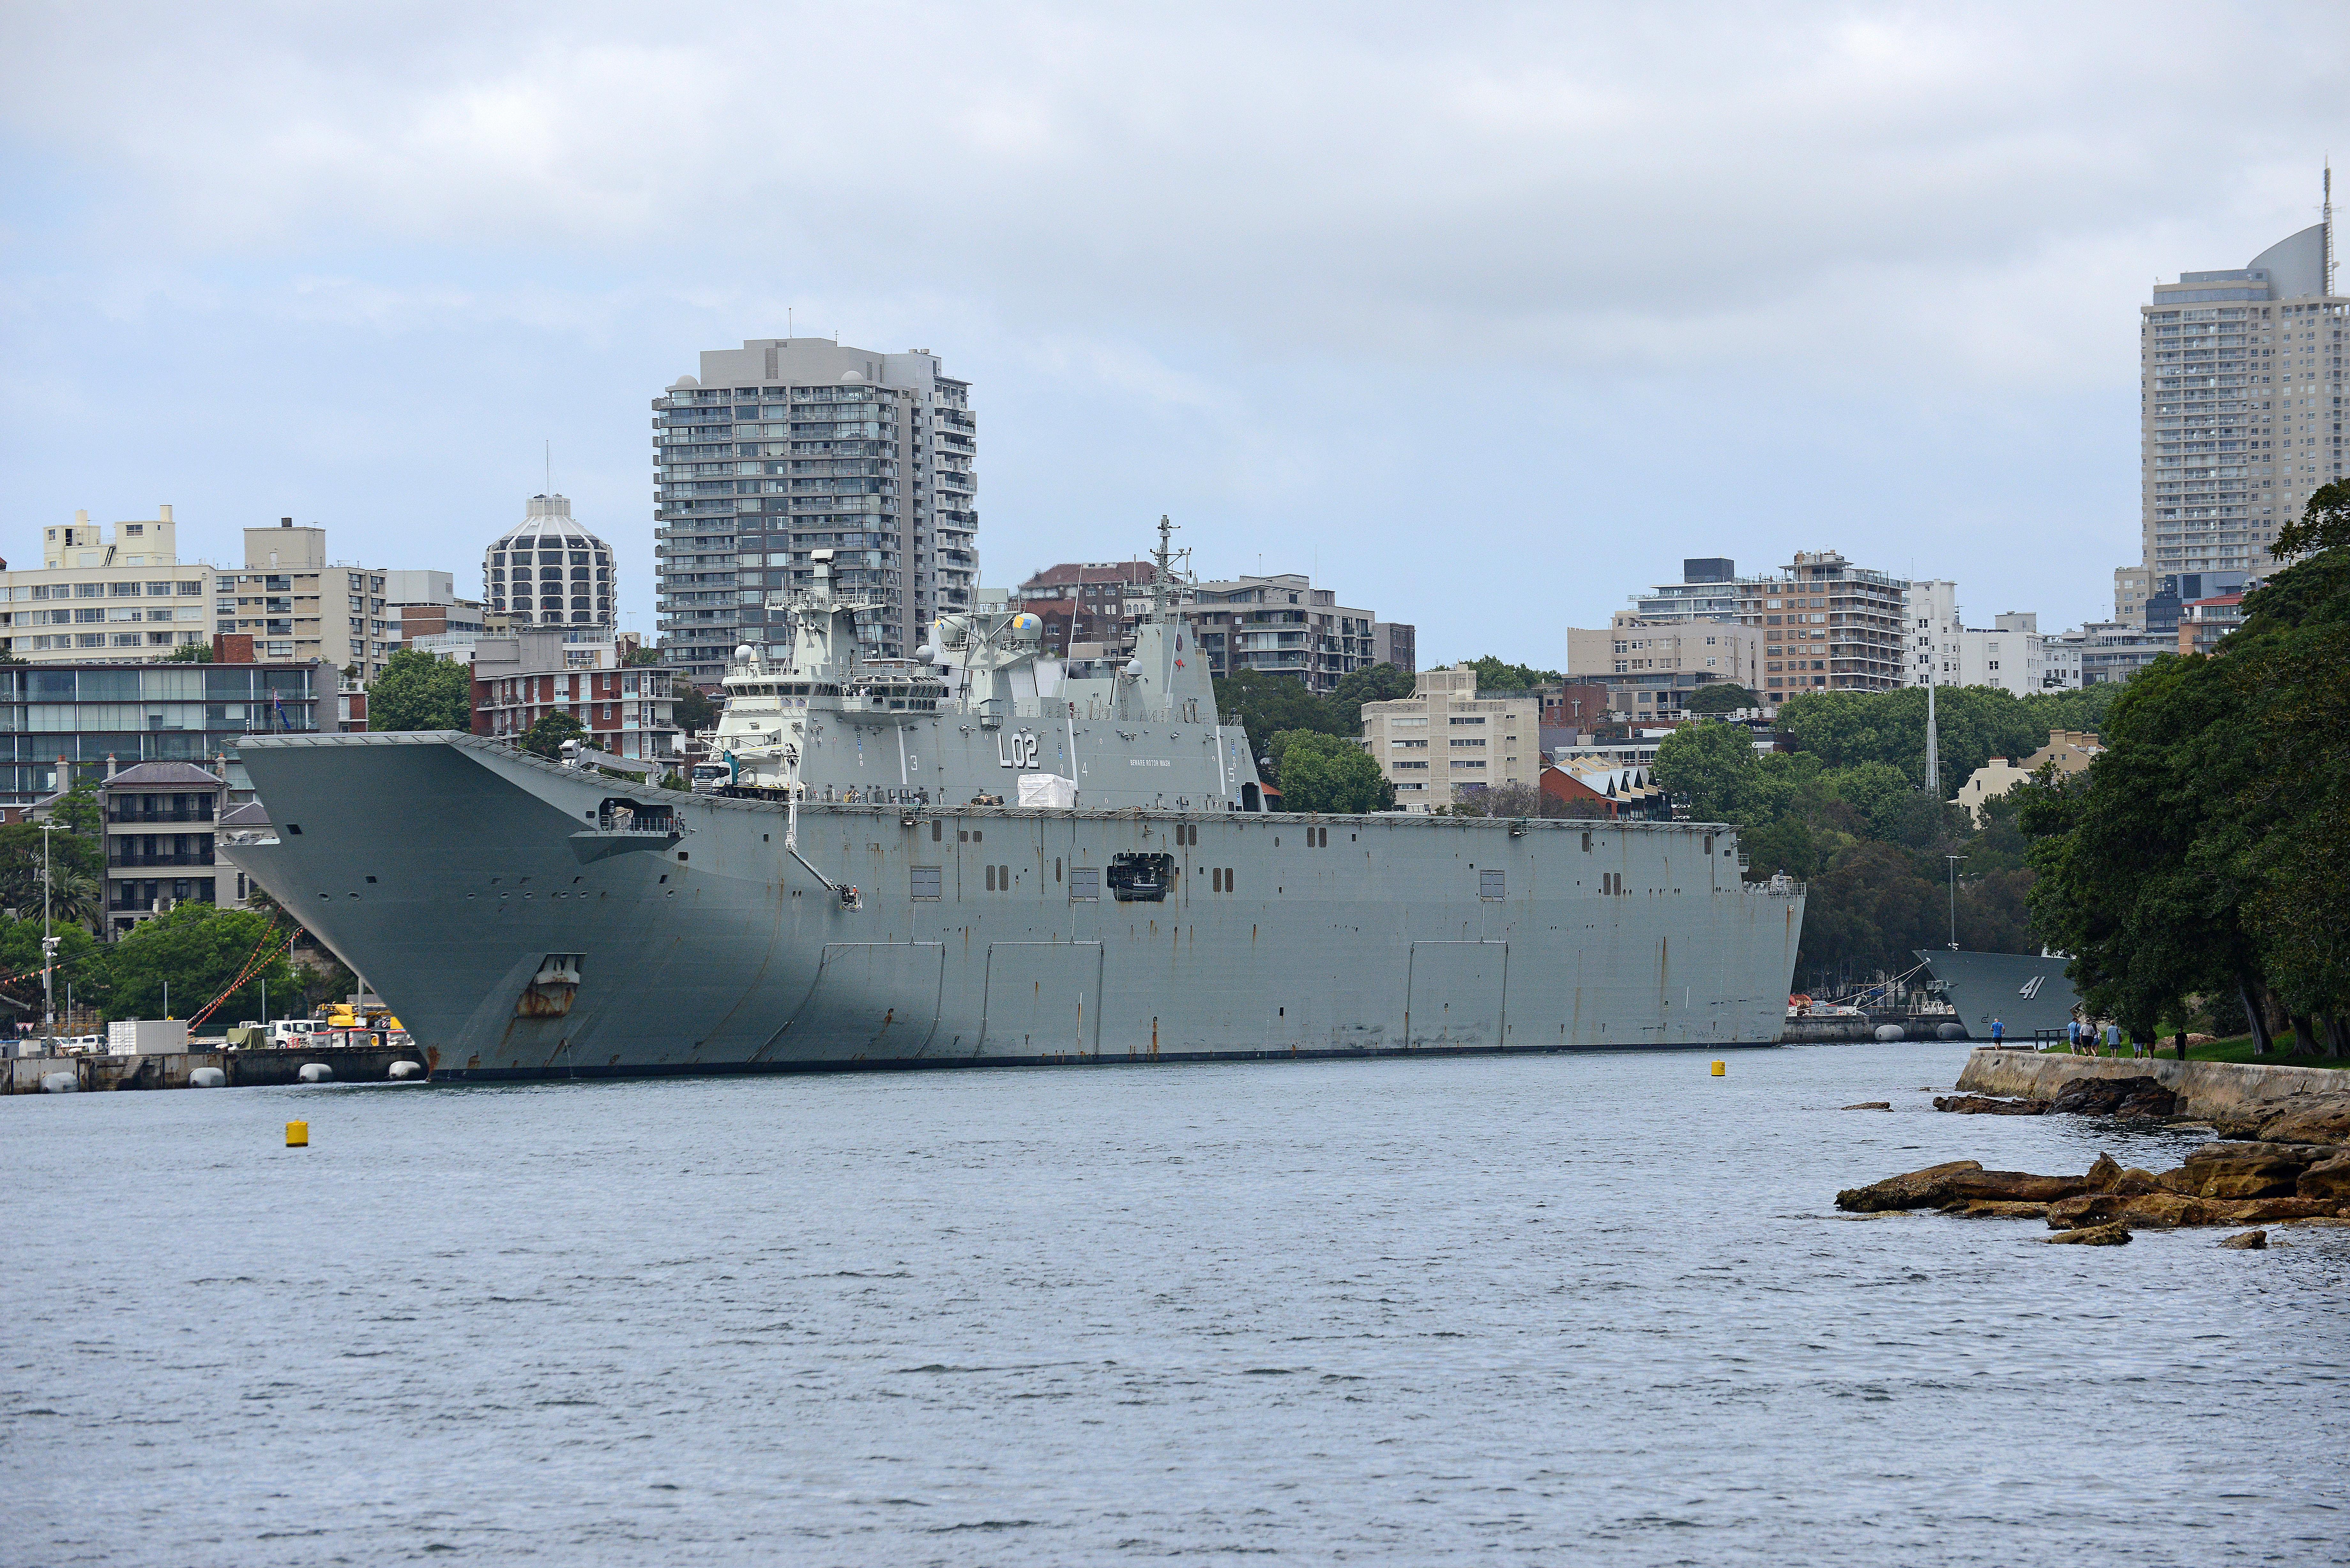 Australian Navy - Marine Australienne - Page 6 46741575482_bd061e3c3b_o